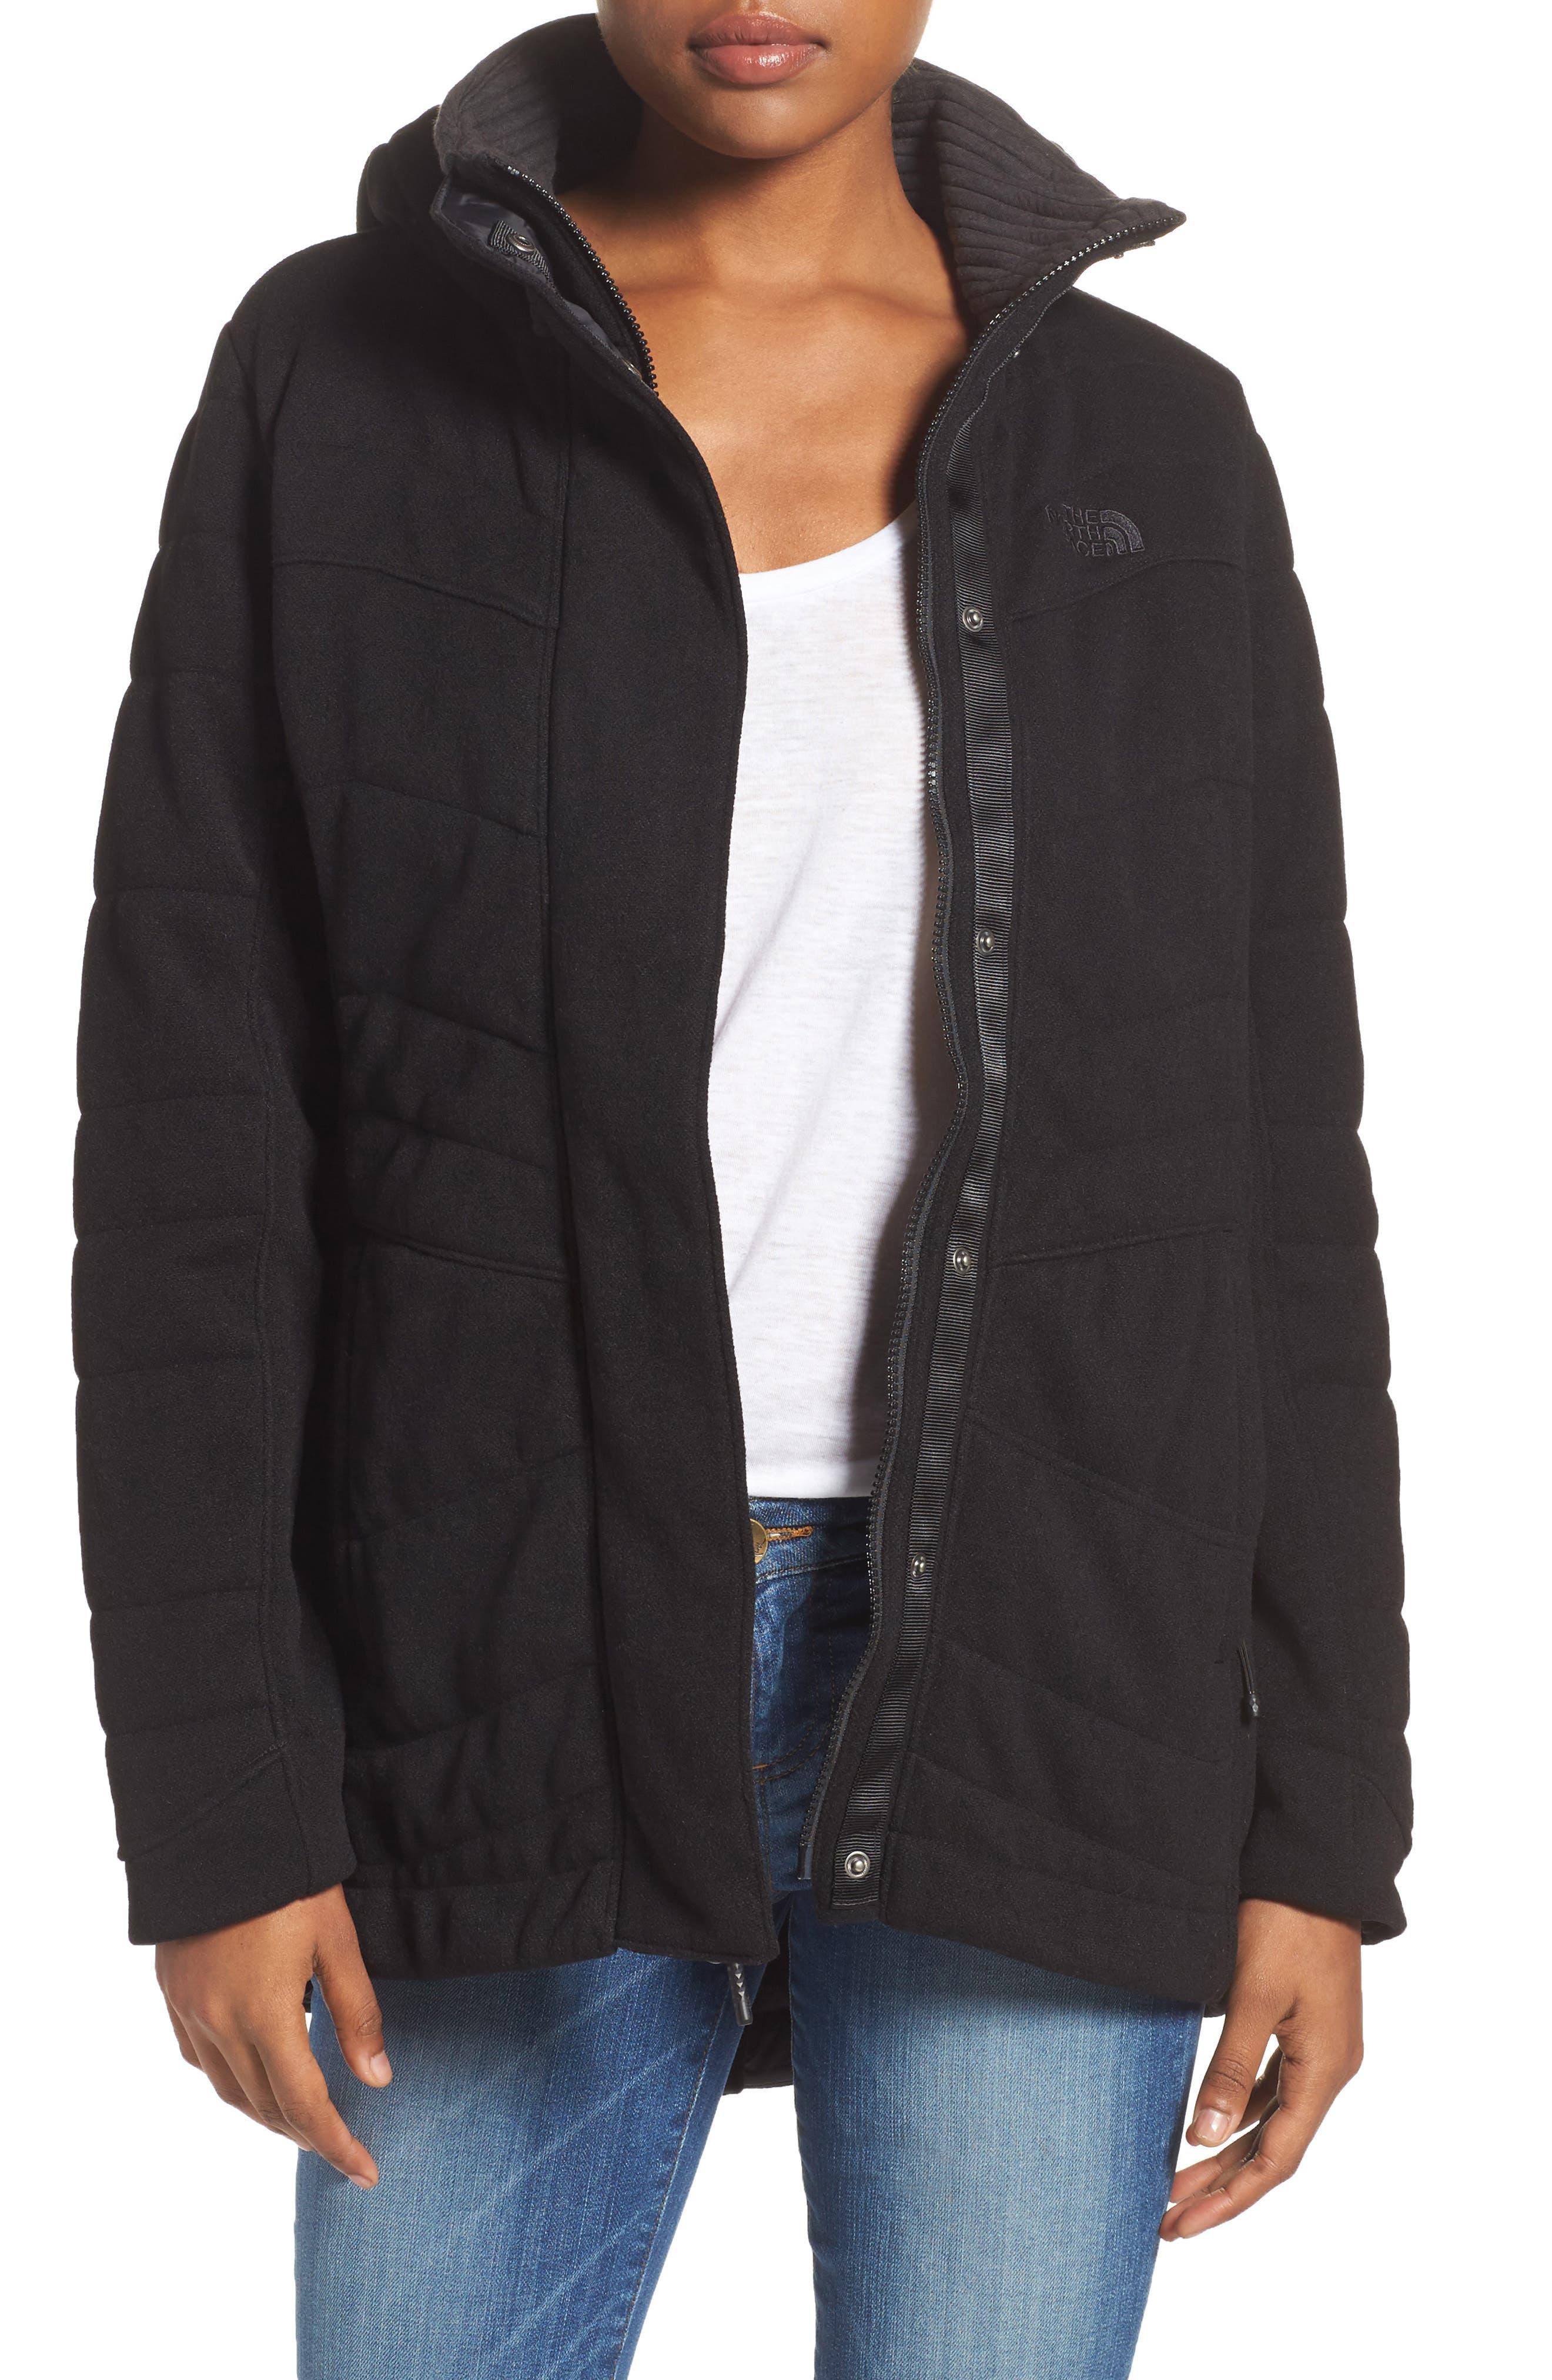 Indi Fleece Jacket,                         Main,                         color, 001